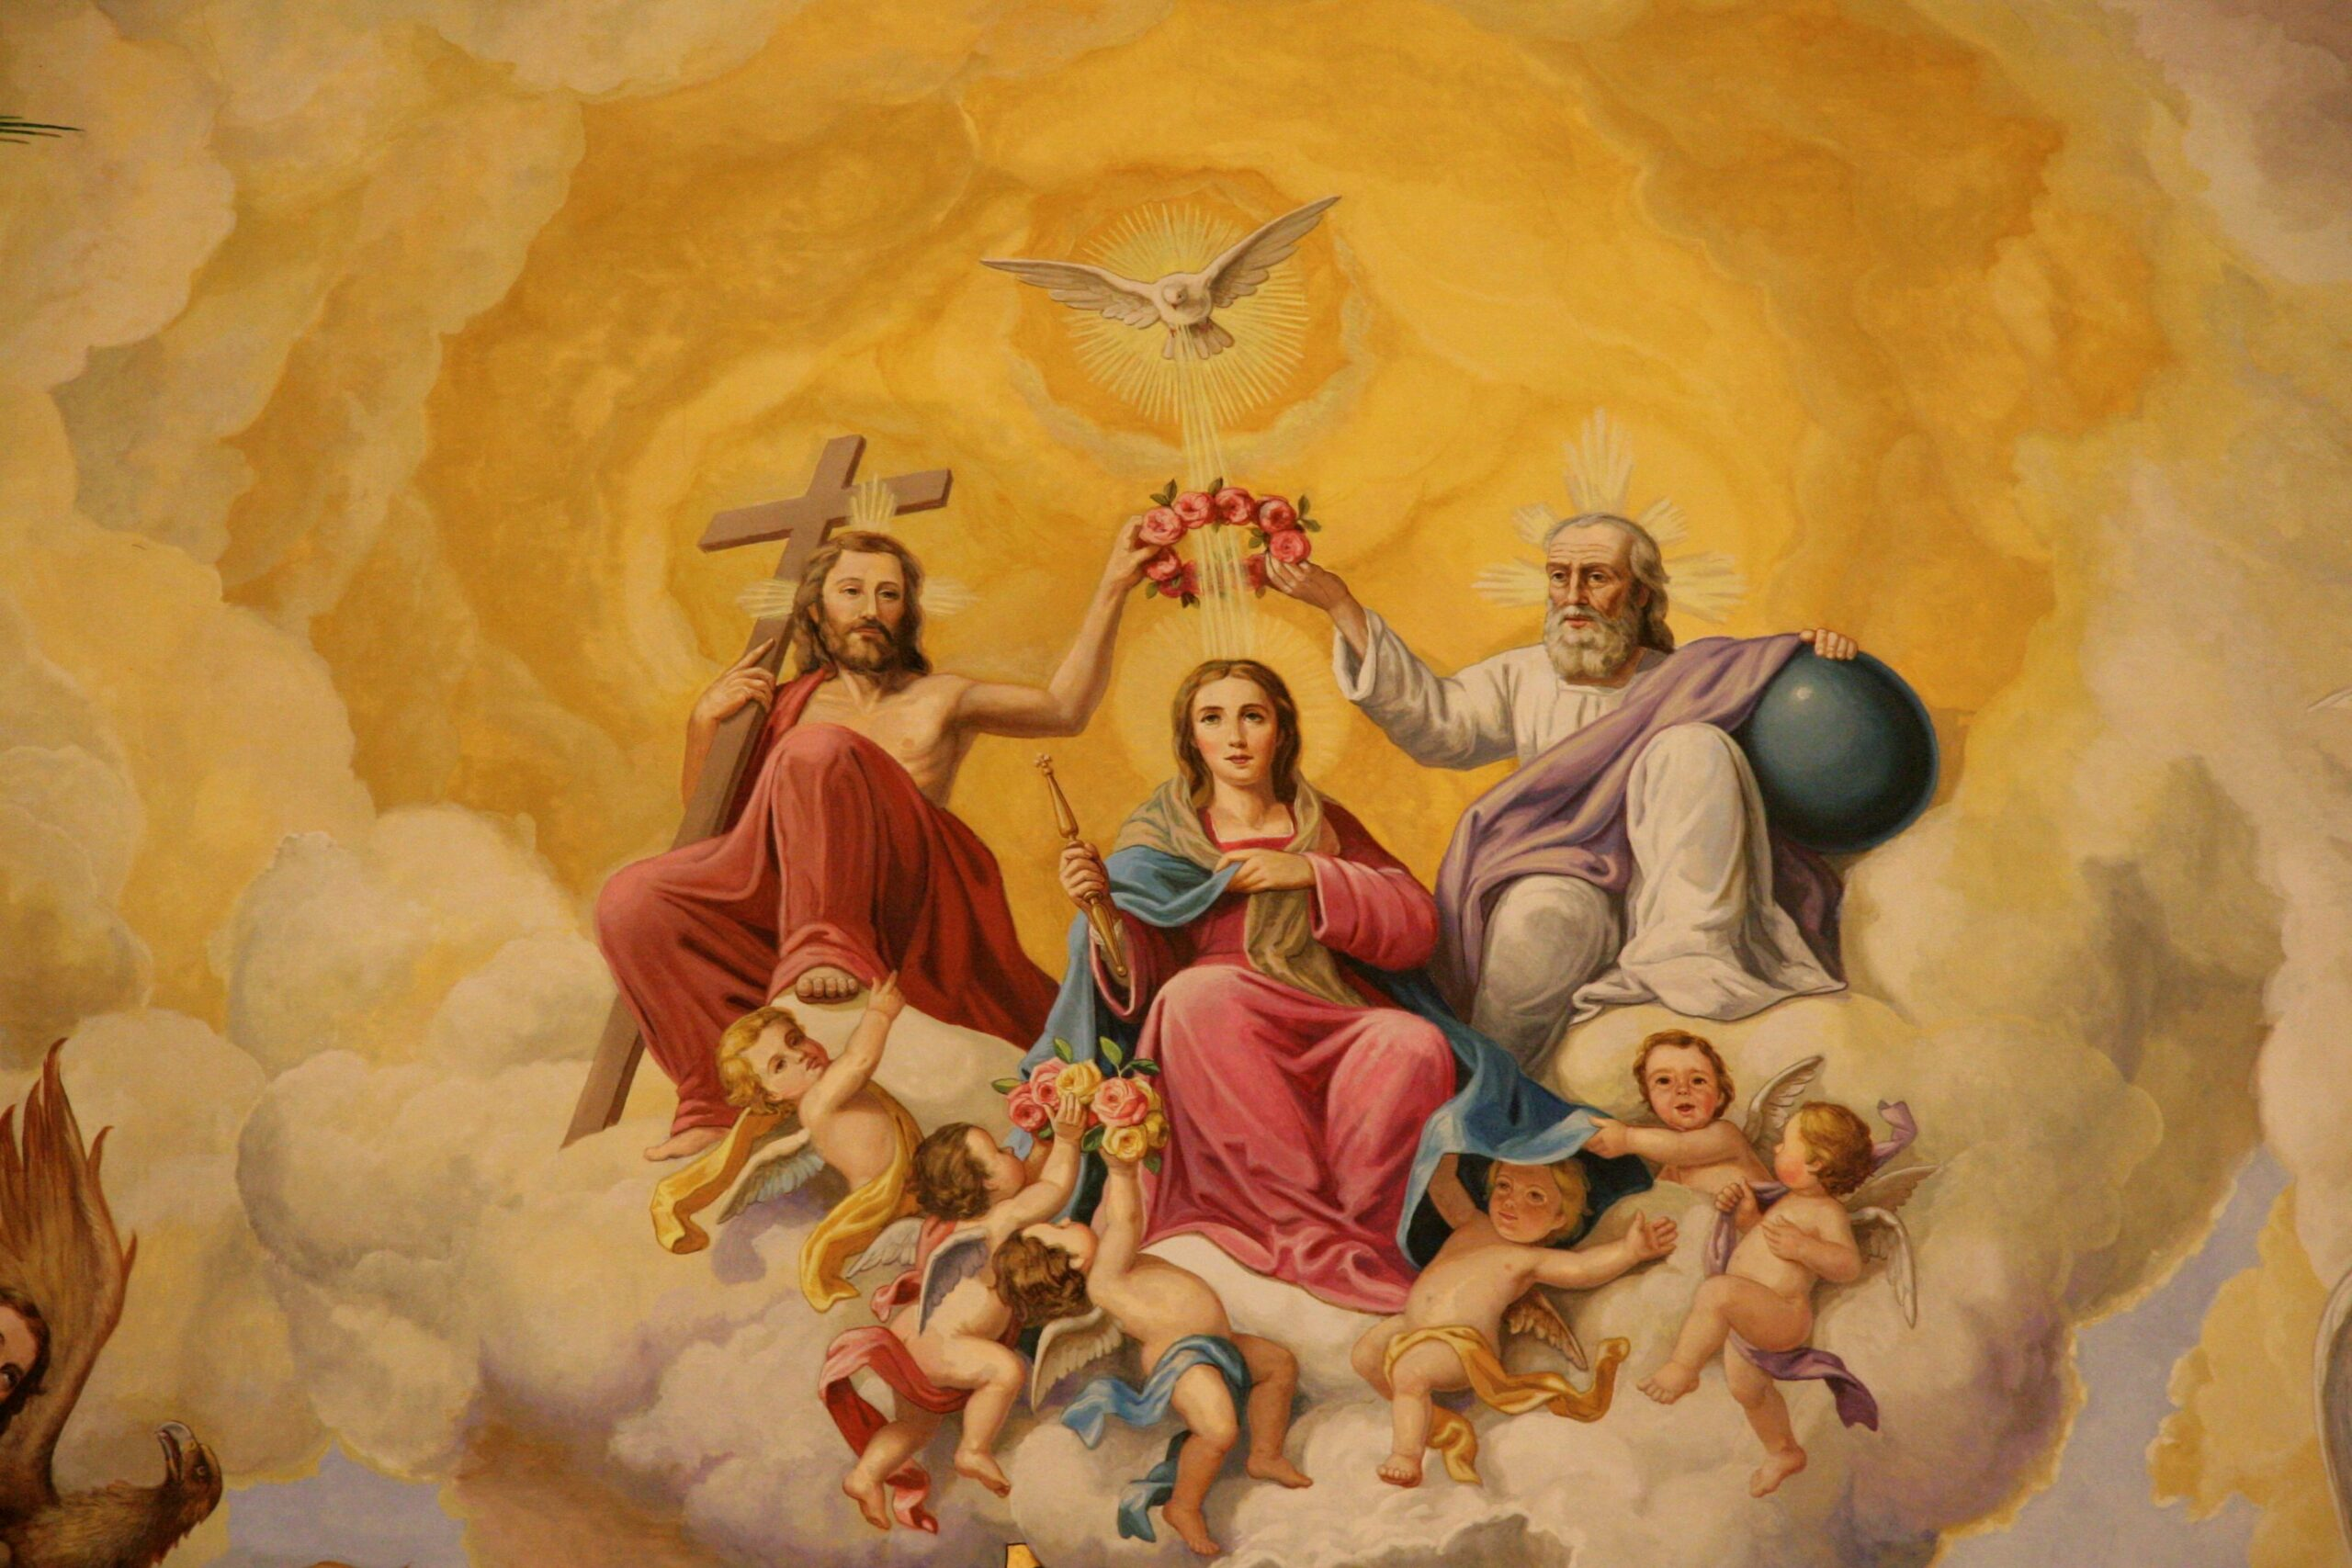 3 Catholic Myths You Probably Believe